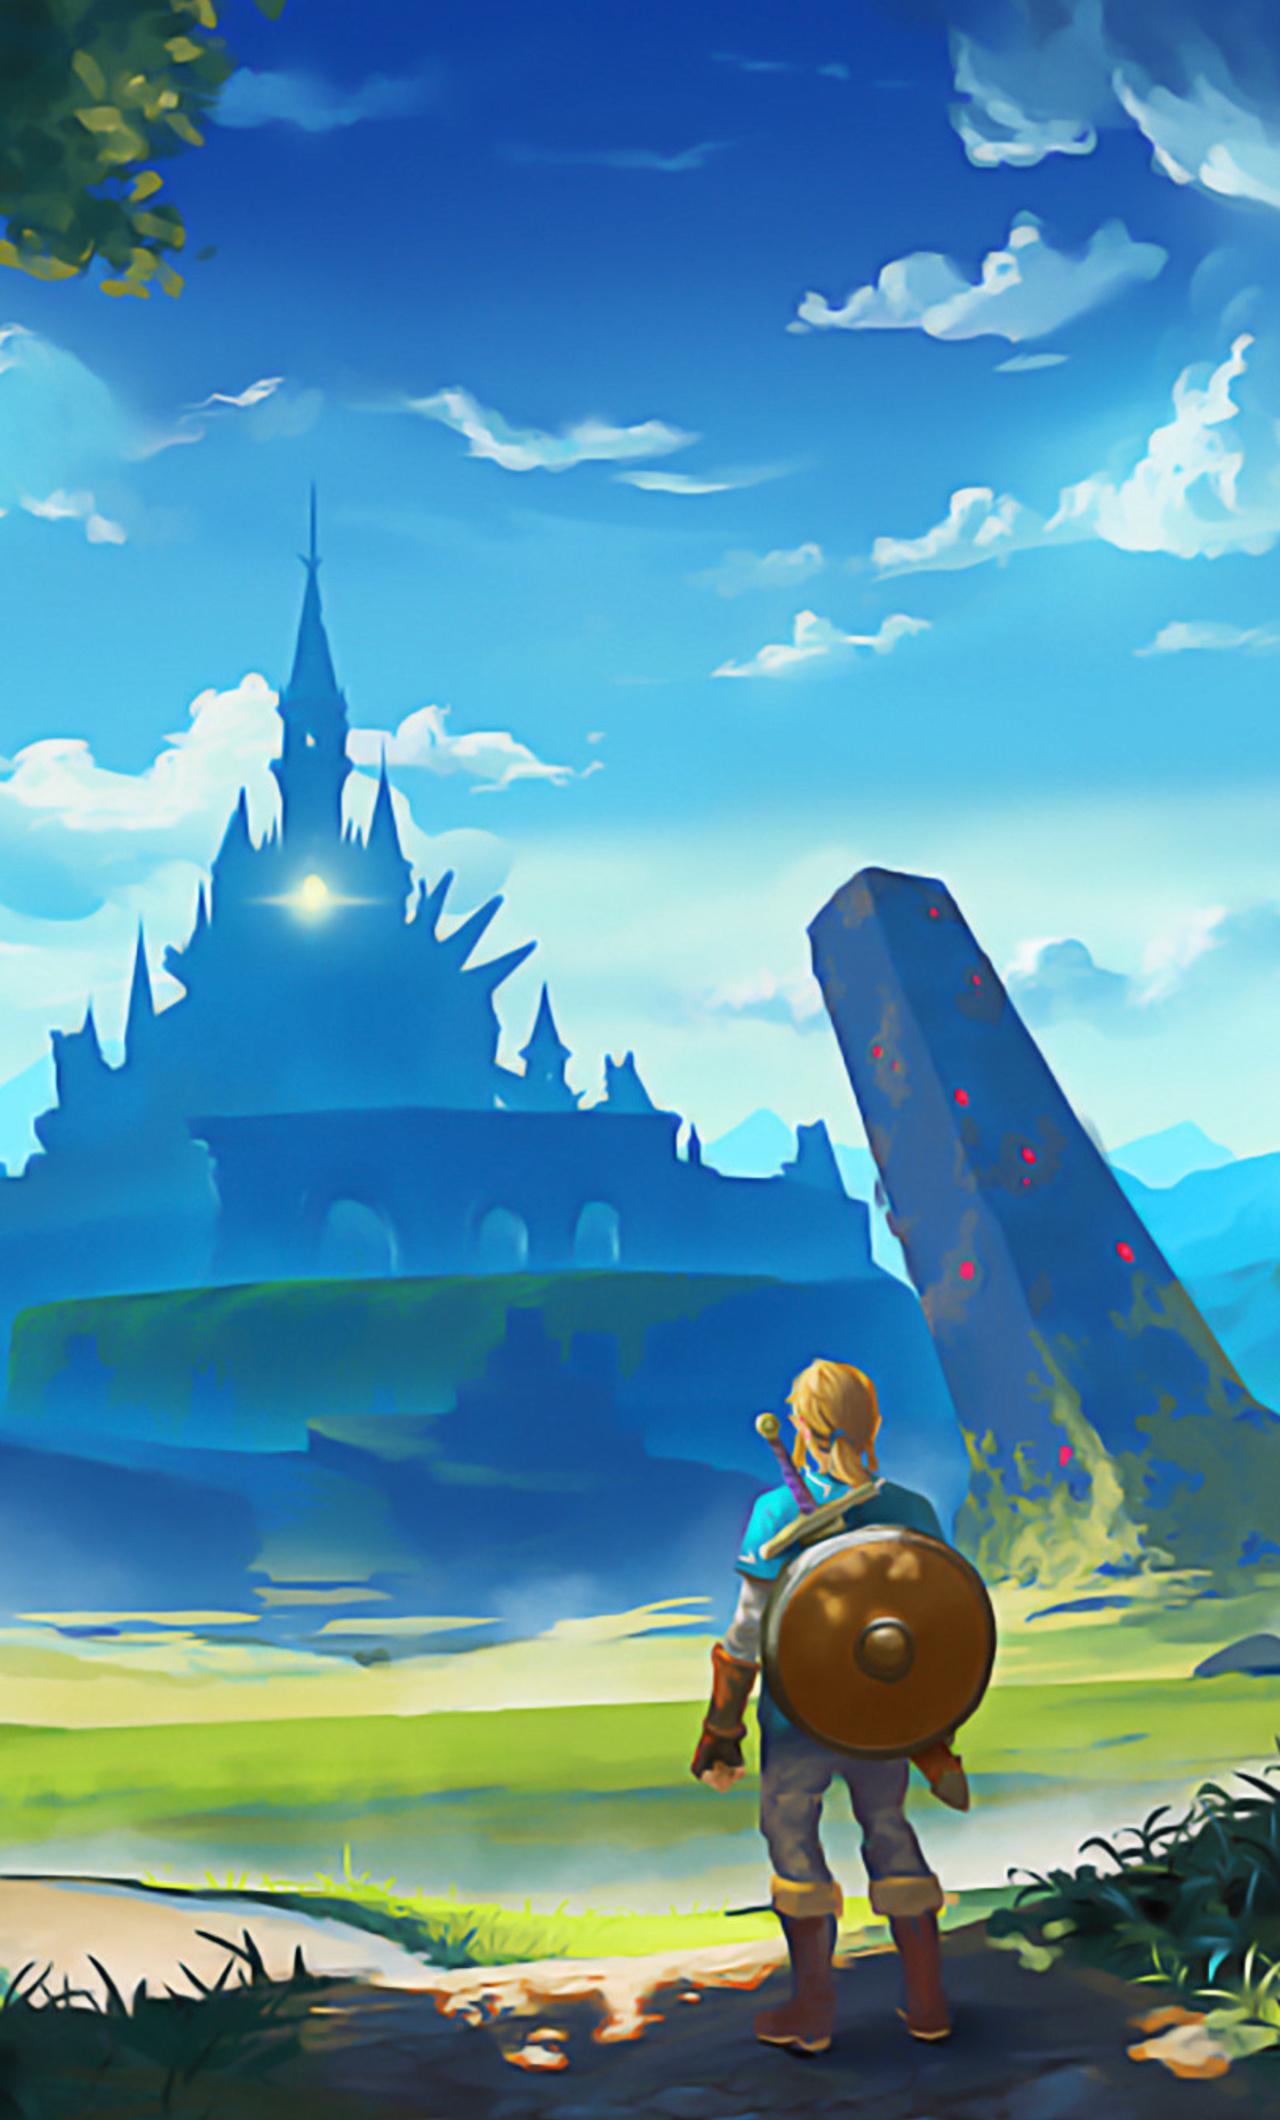 1280x2120 The Legend Of Zelda Breath Of The Wild Artworks Iphone 6